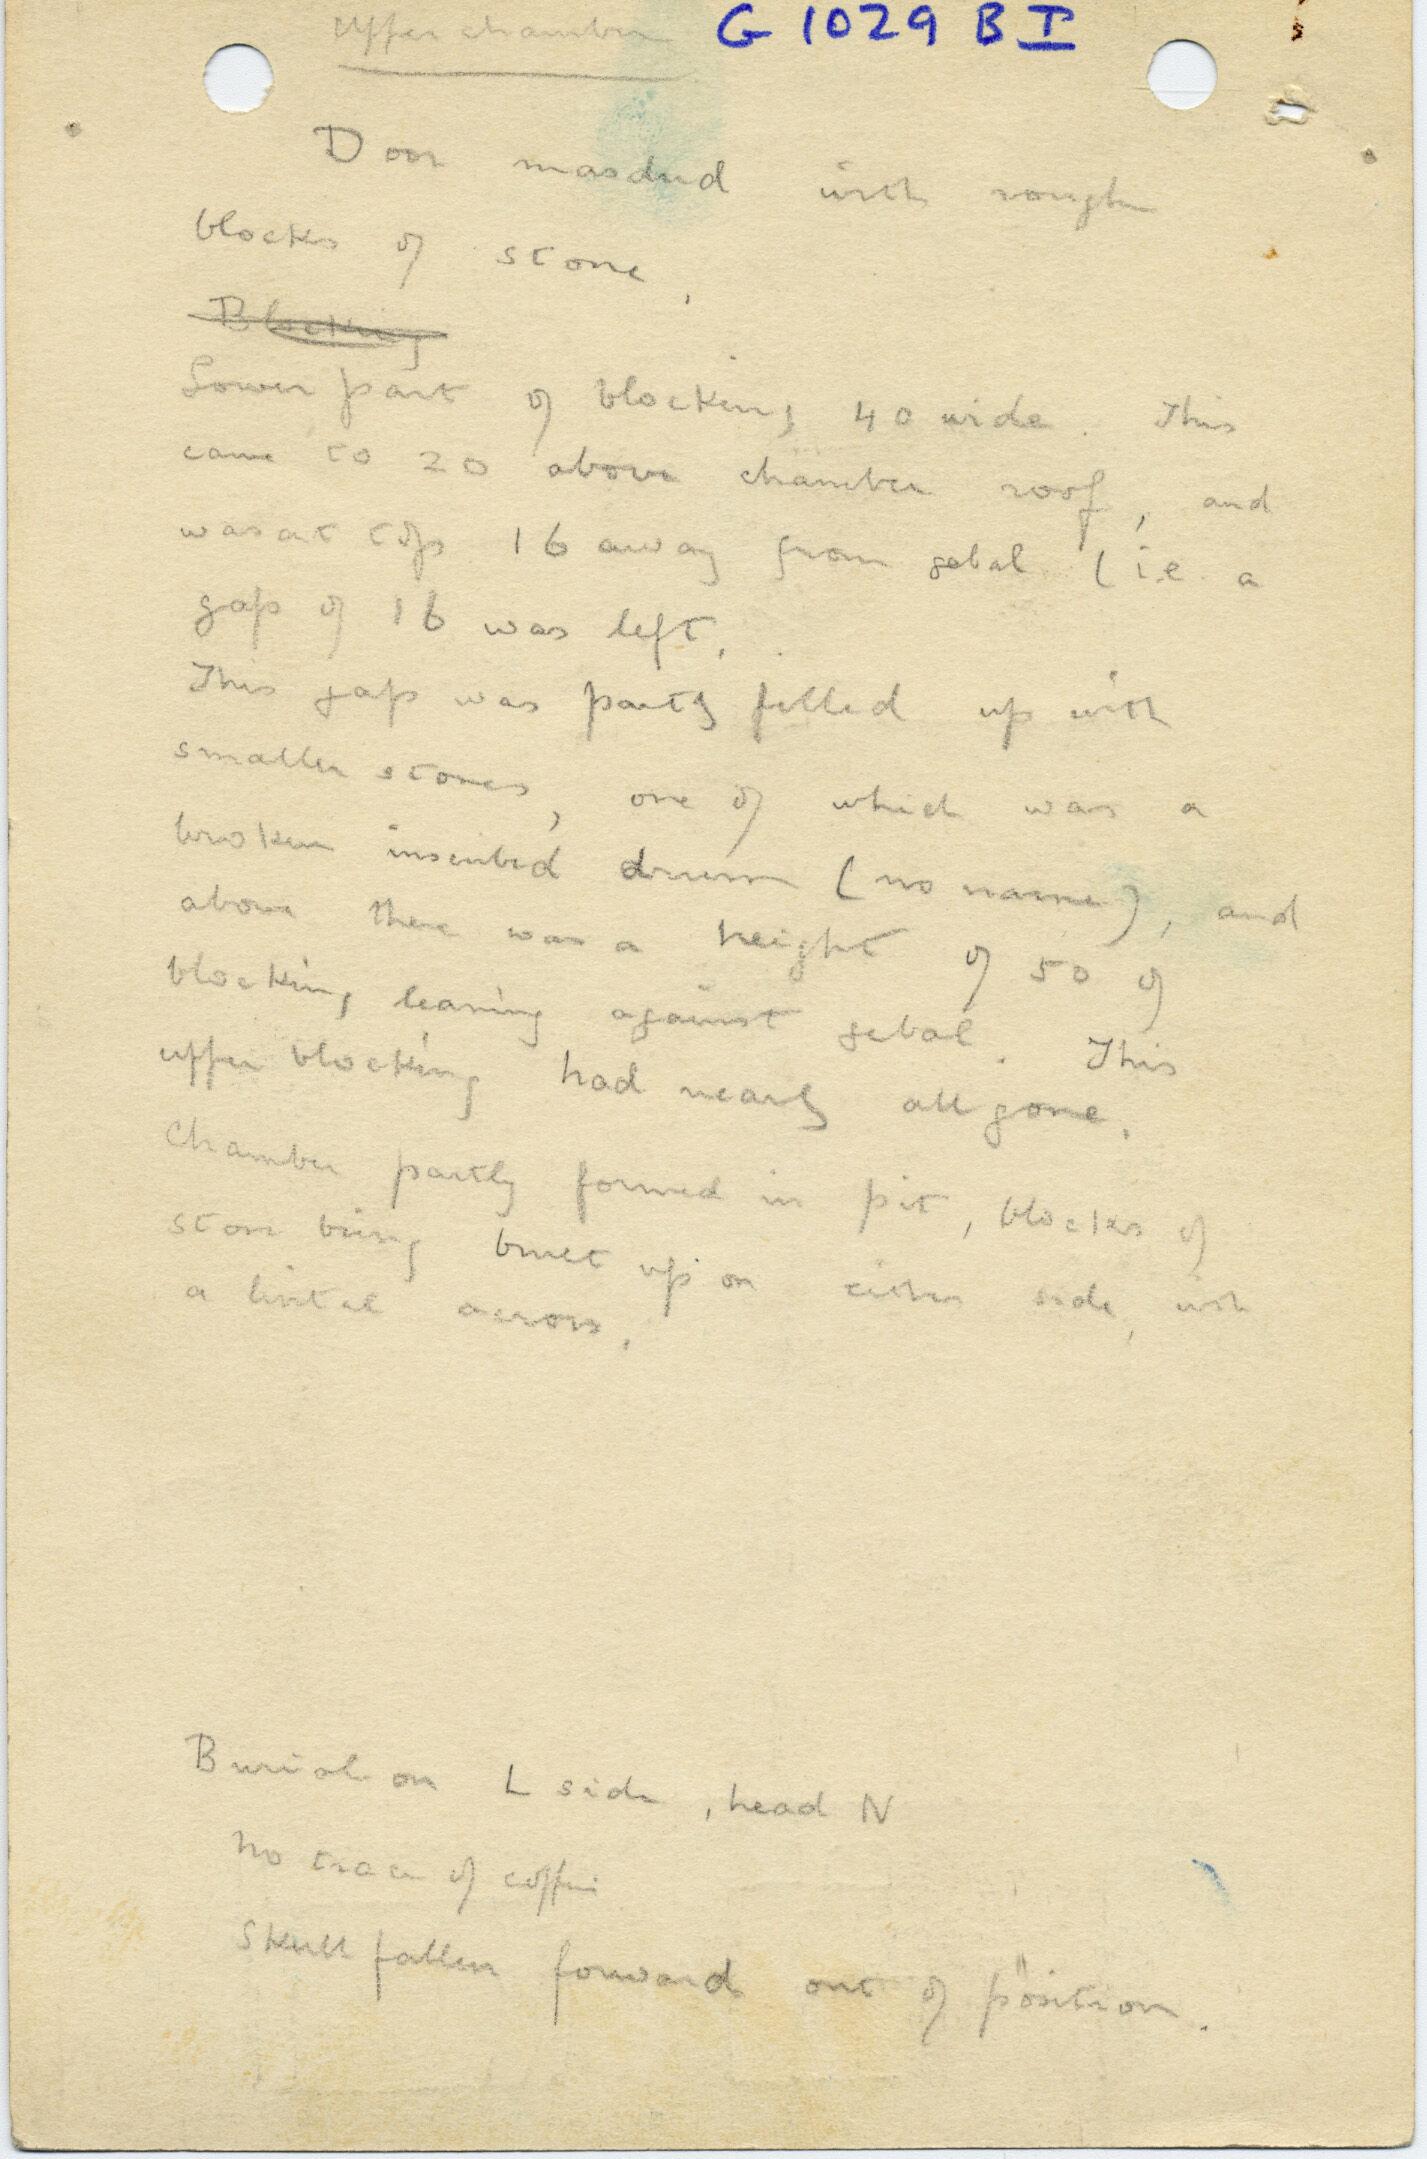 Notes: G 1029, Shaft B (I), notes